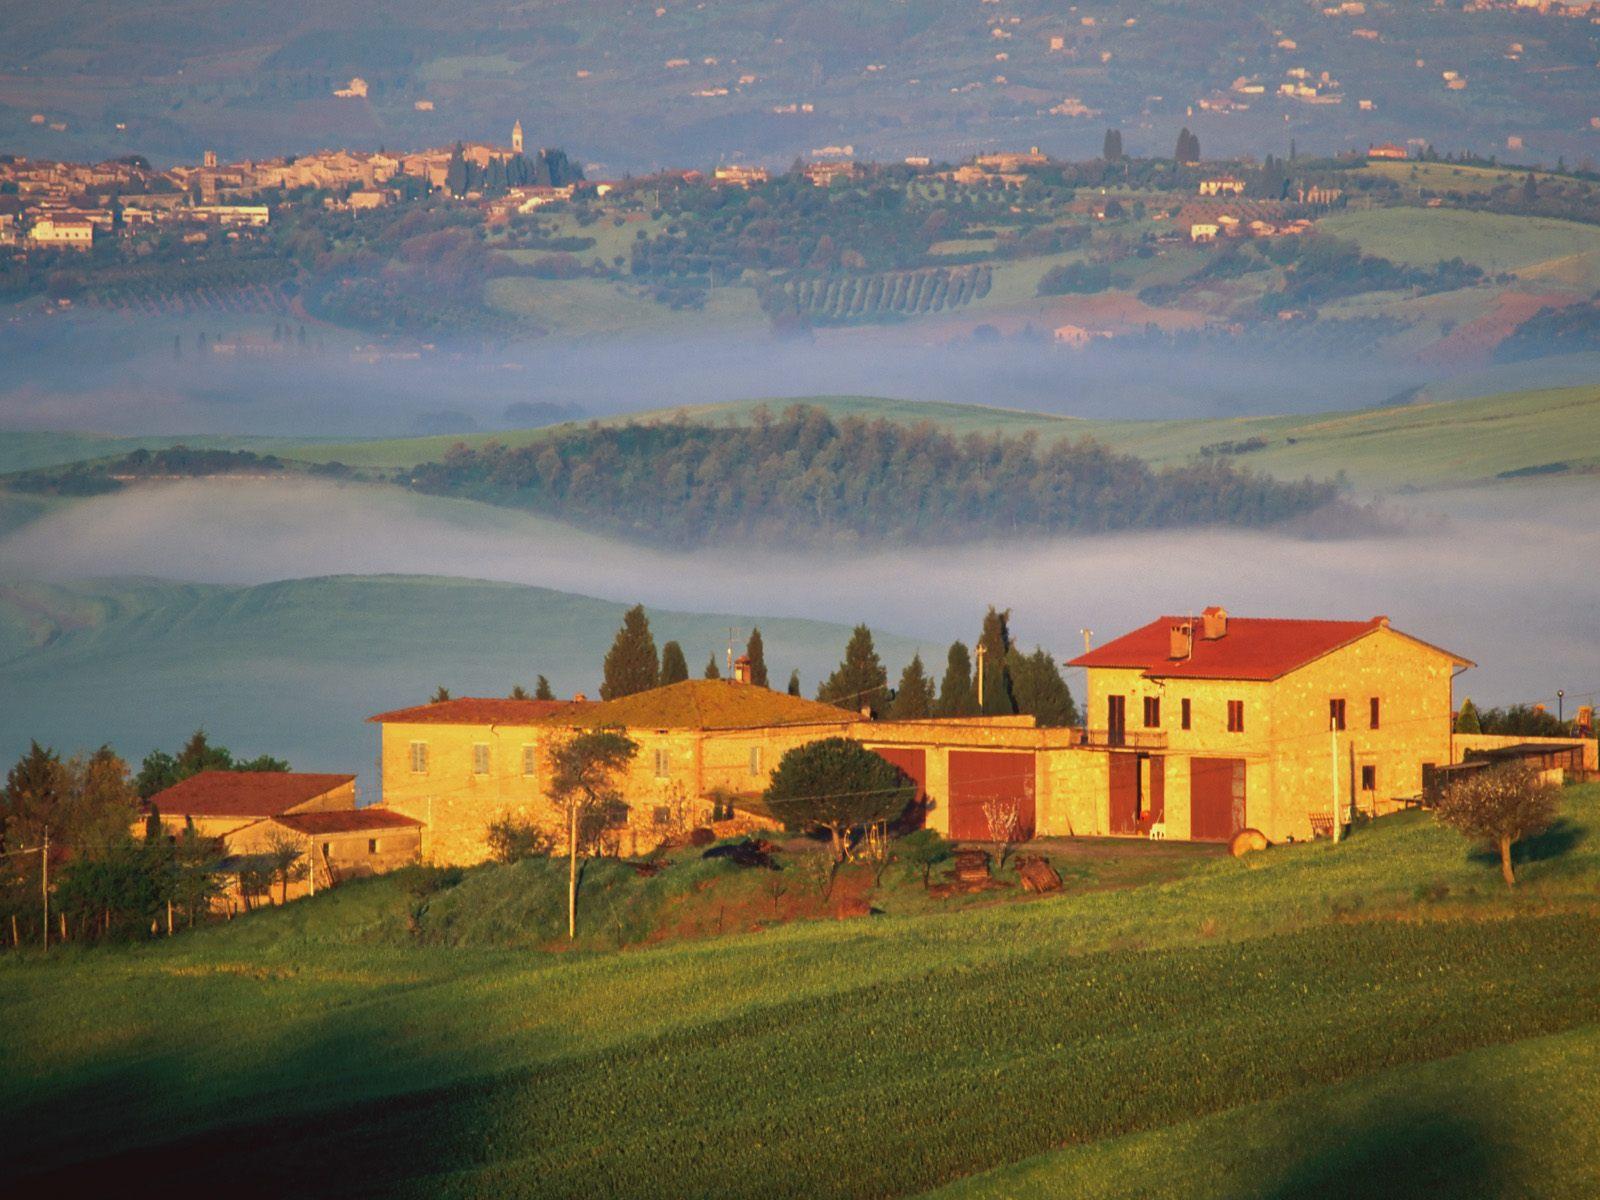 http://3.bp.blogspot.com/-gV2Gf20JuzY/Tcp5DflQPUI/AAAAAAAACYg/Kxx5ItjJHSA/s1600/Val+d%25D2%2591Orcia%252C+Tuscany%252C+Italy.jpg